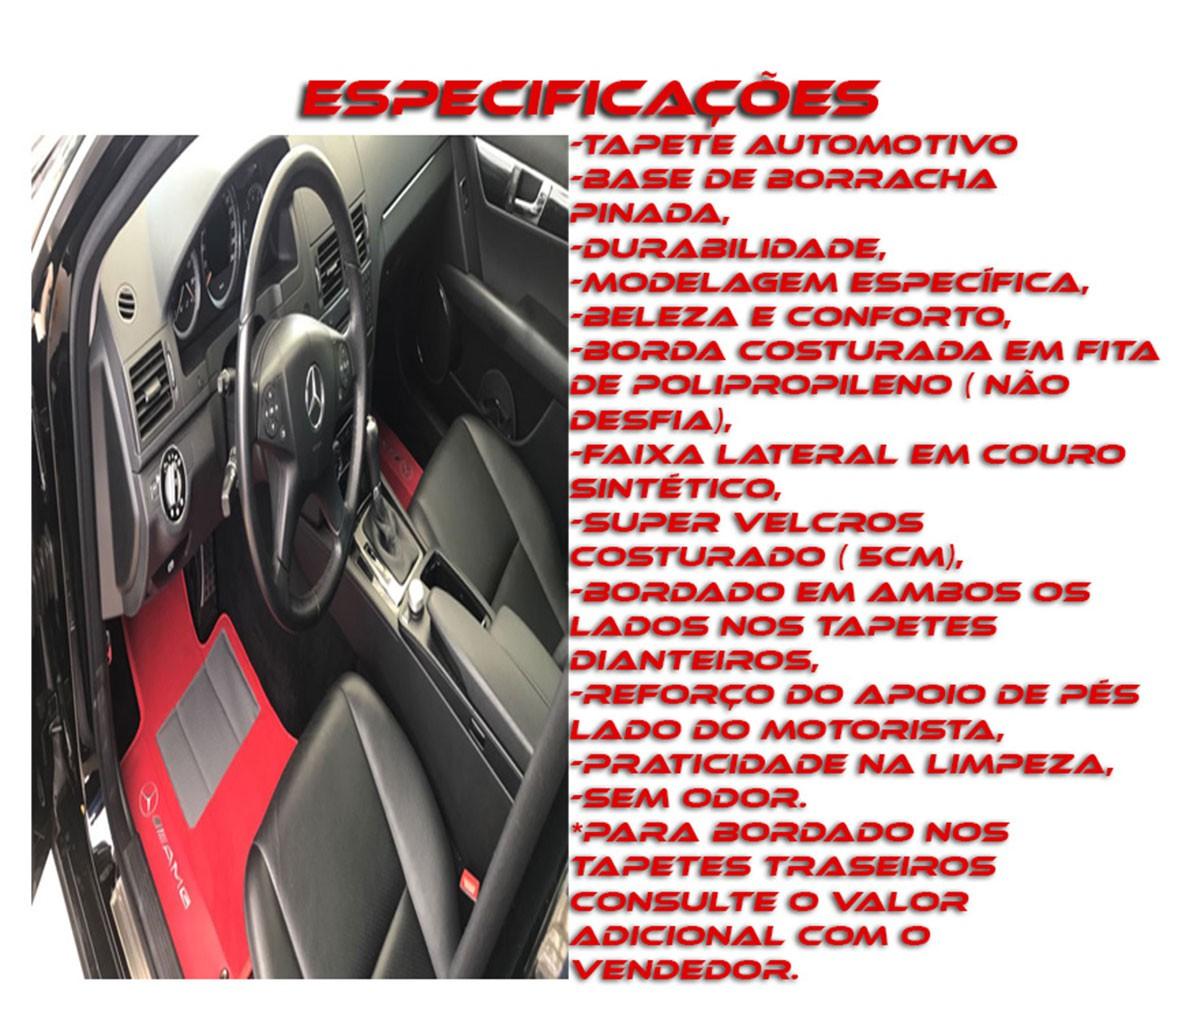 Kit Jogo de Tapete + Porta Malas Hitto Onix Activ Luxo  Base Pinada